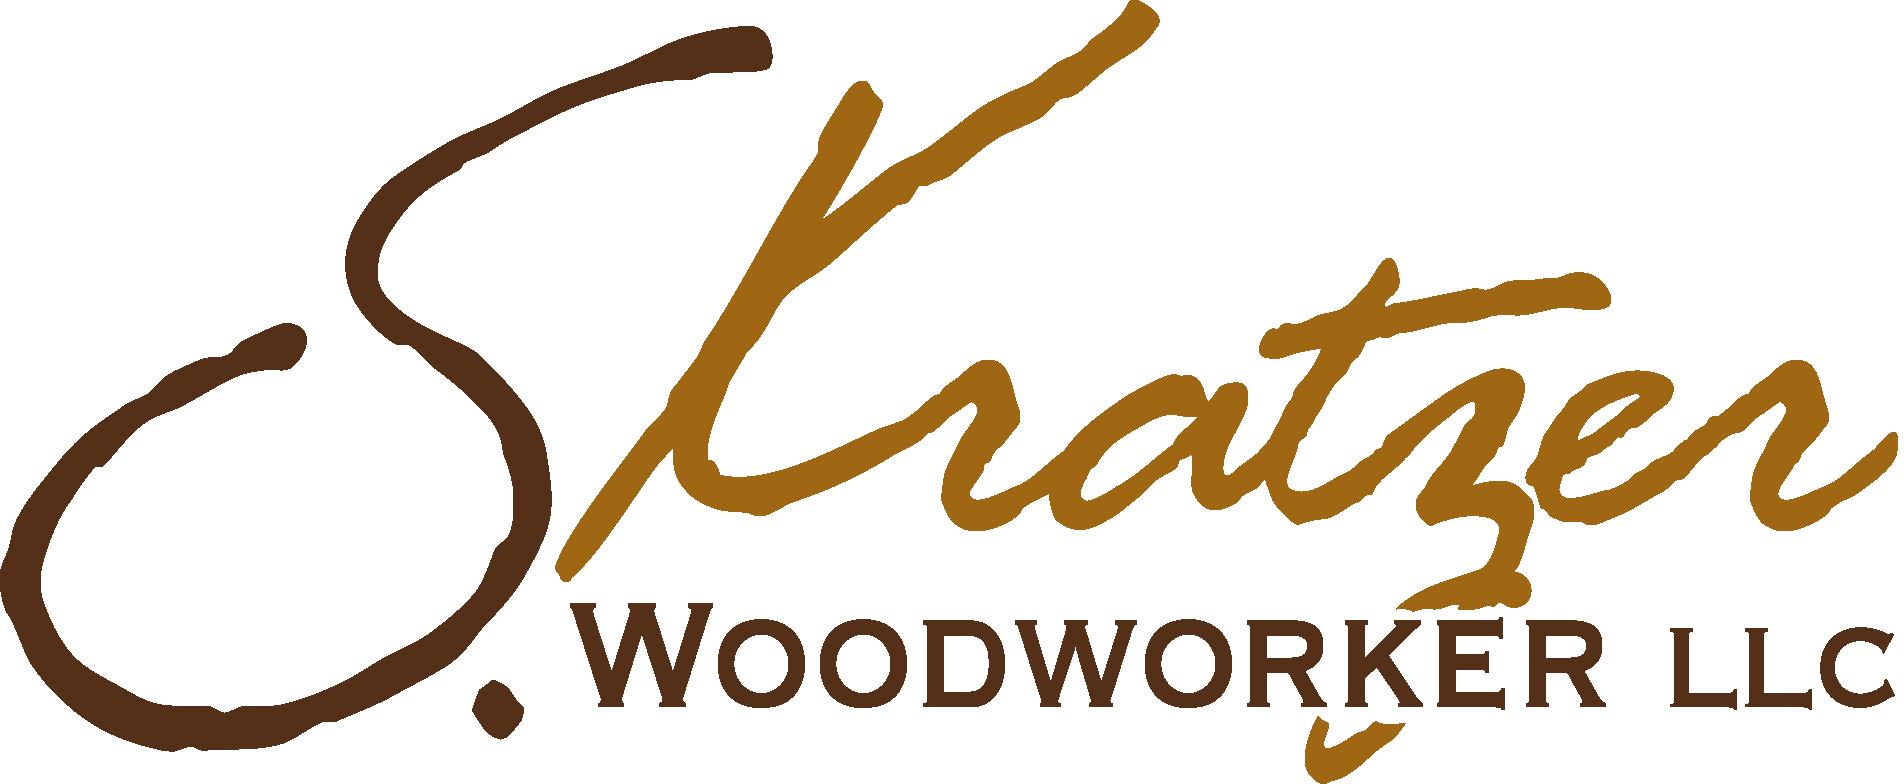 SteveKratzerWoodworker